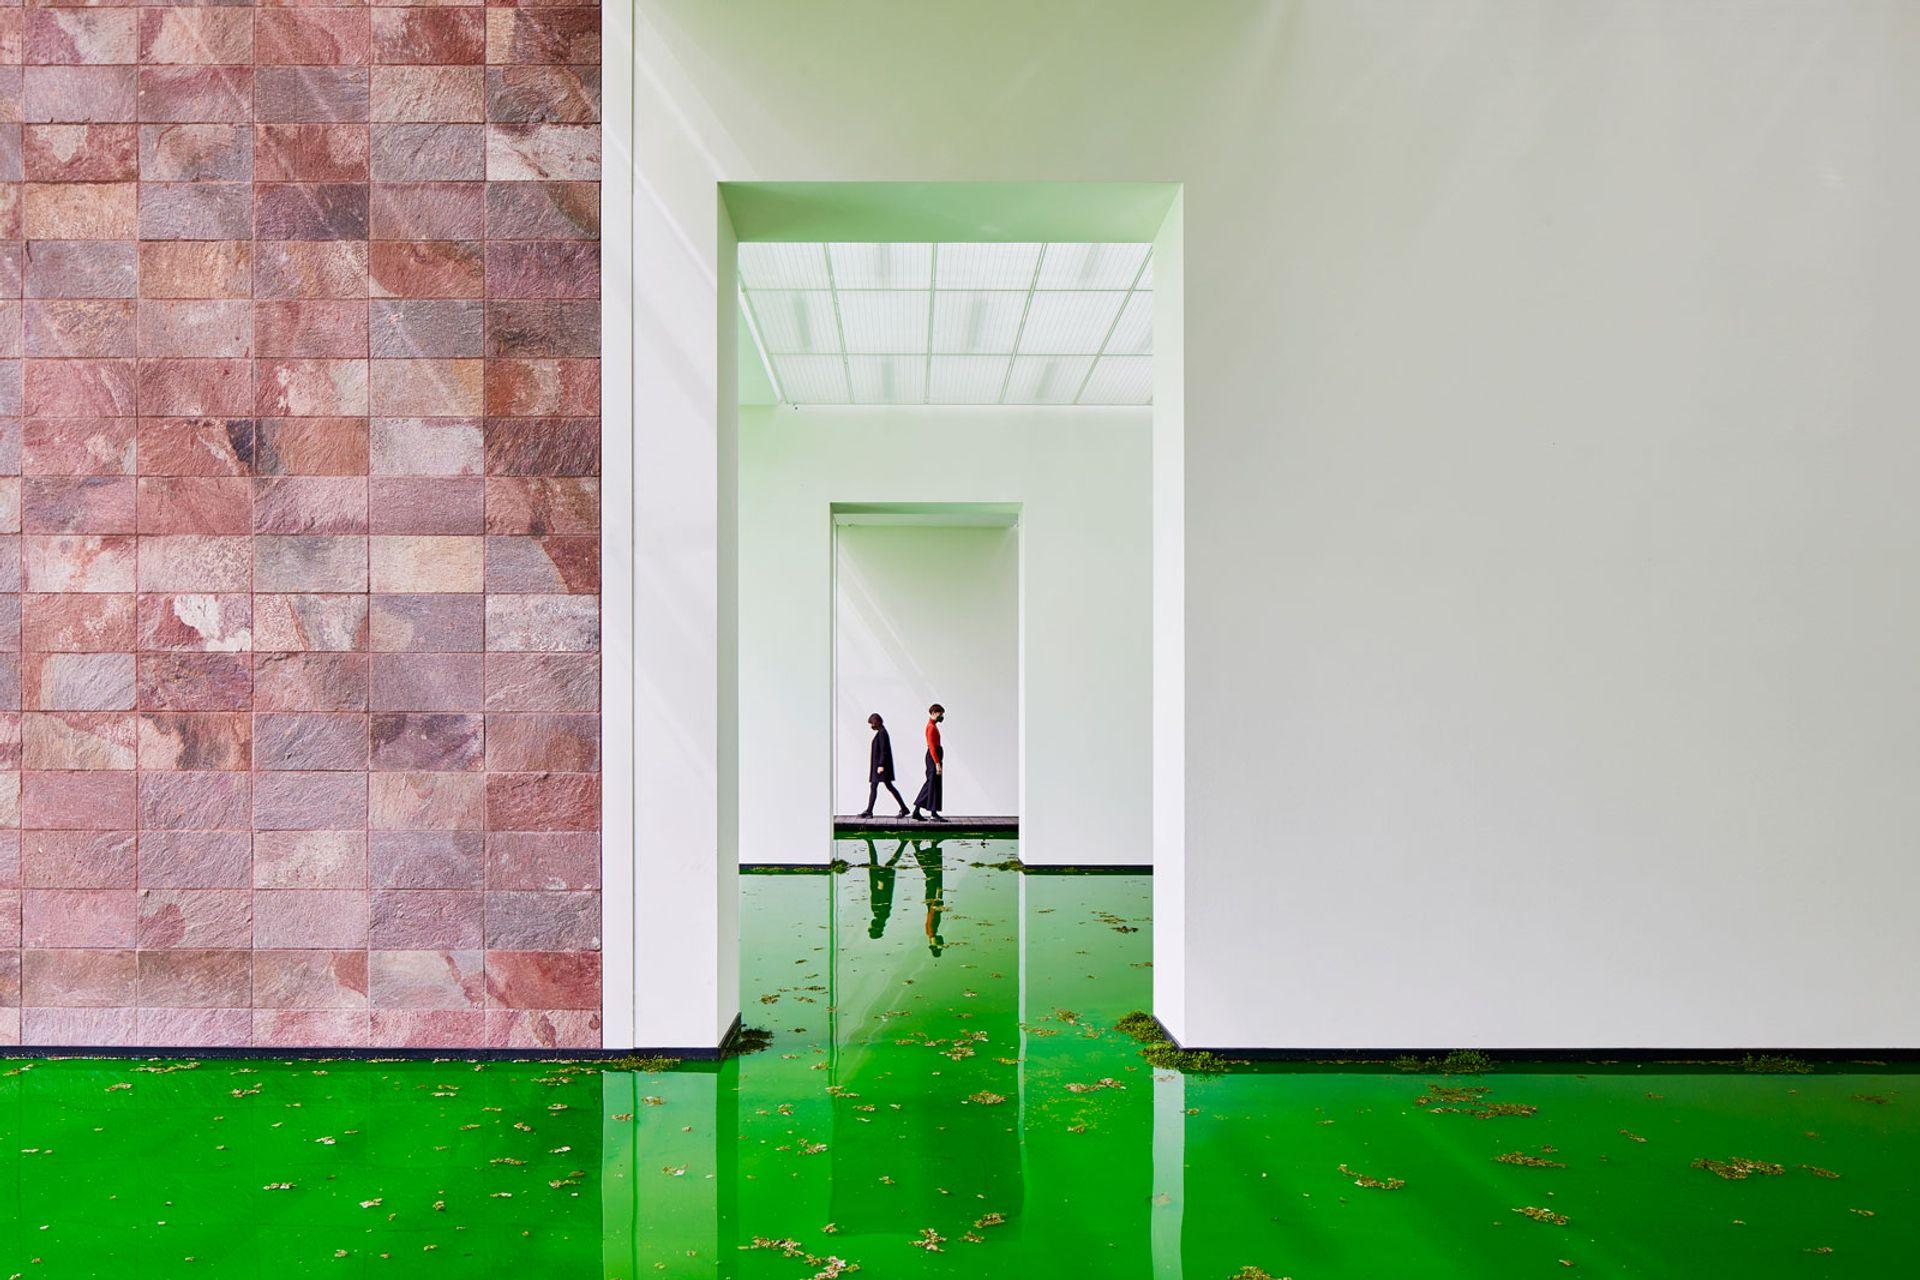 Installation view of Olafur Eliasson's Life installation at the Fondation Beyeler Courtesy of the artist; neugerriemschneider; Tanya Bonakdar Gallery. © 2021 Olafur Eliasson, Photo: Mark Niedermann